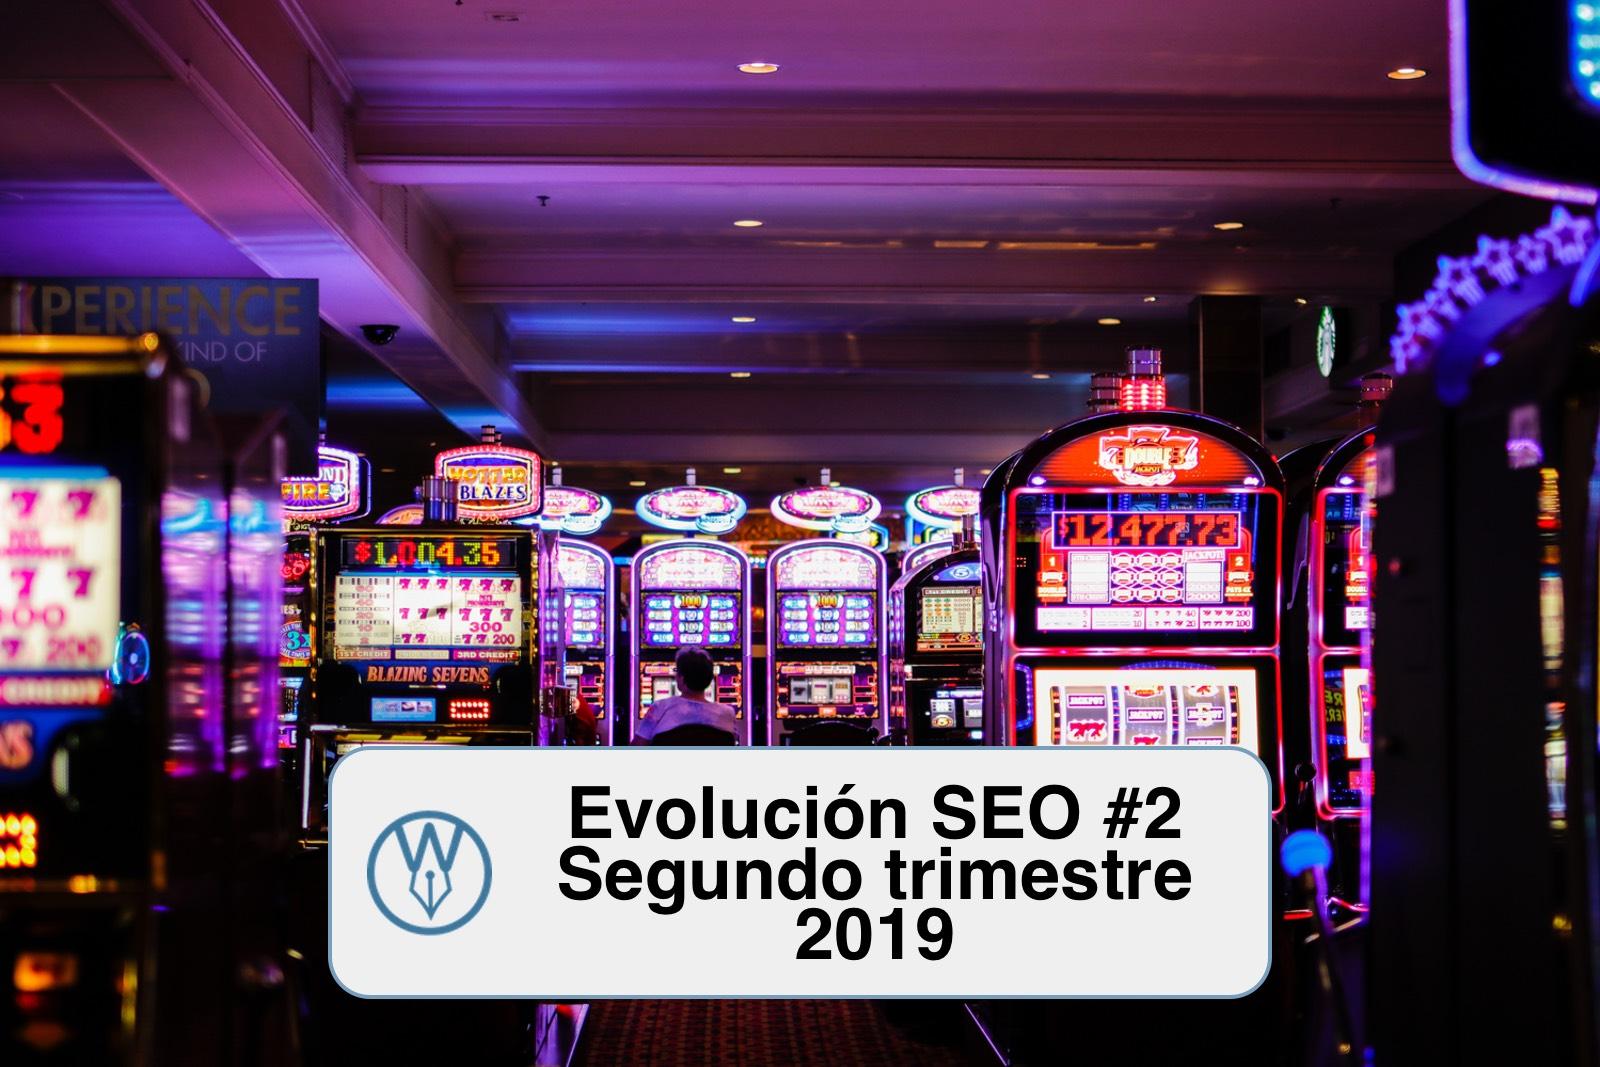 Evolucion SEO 2 segundo trimestre 2019